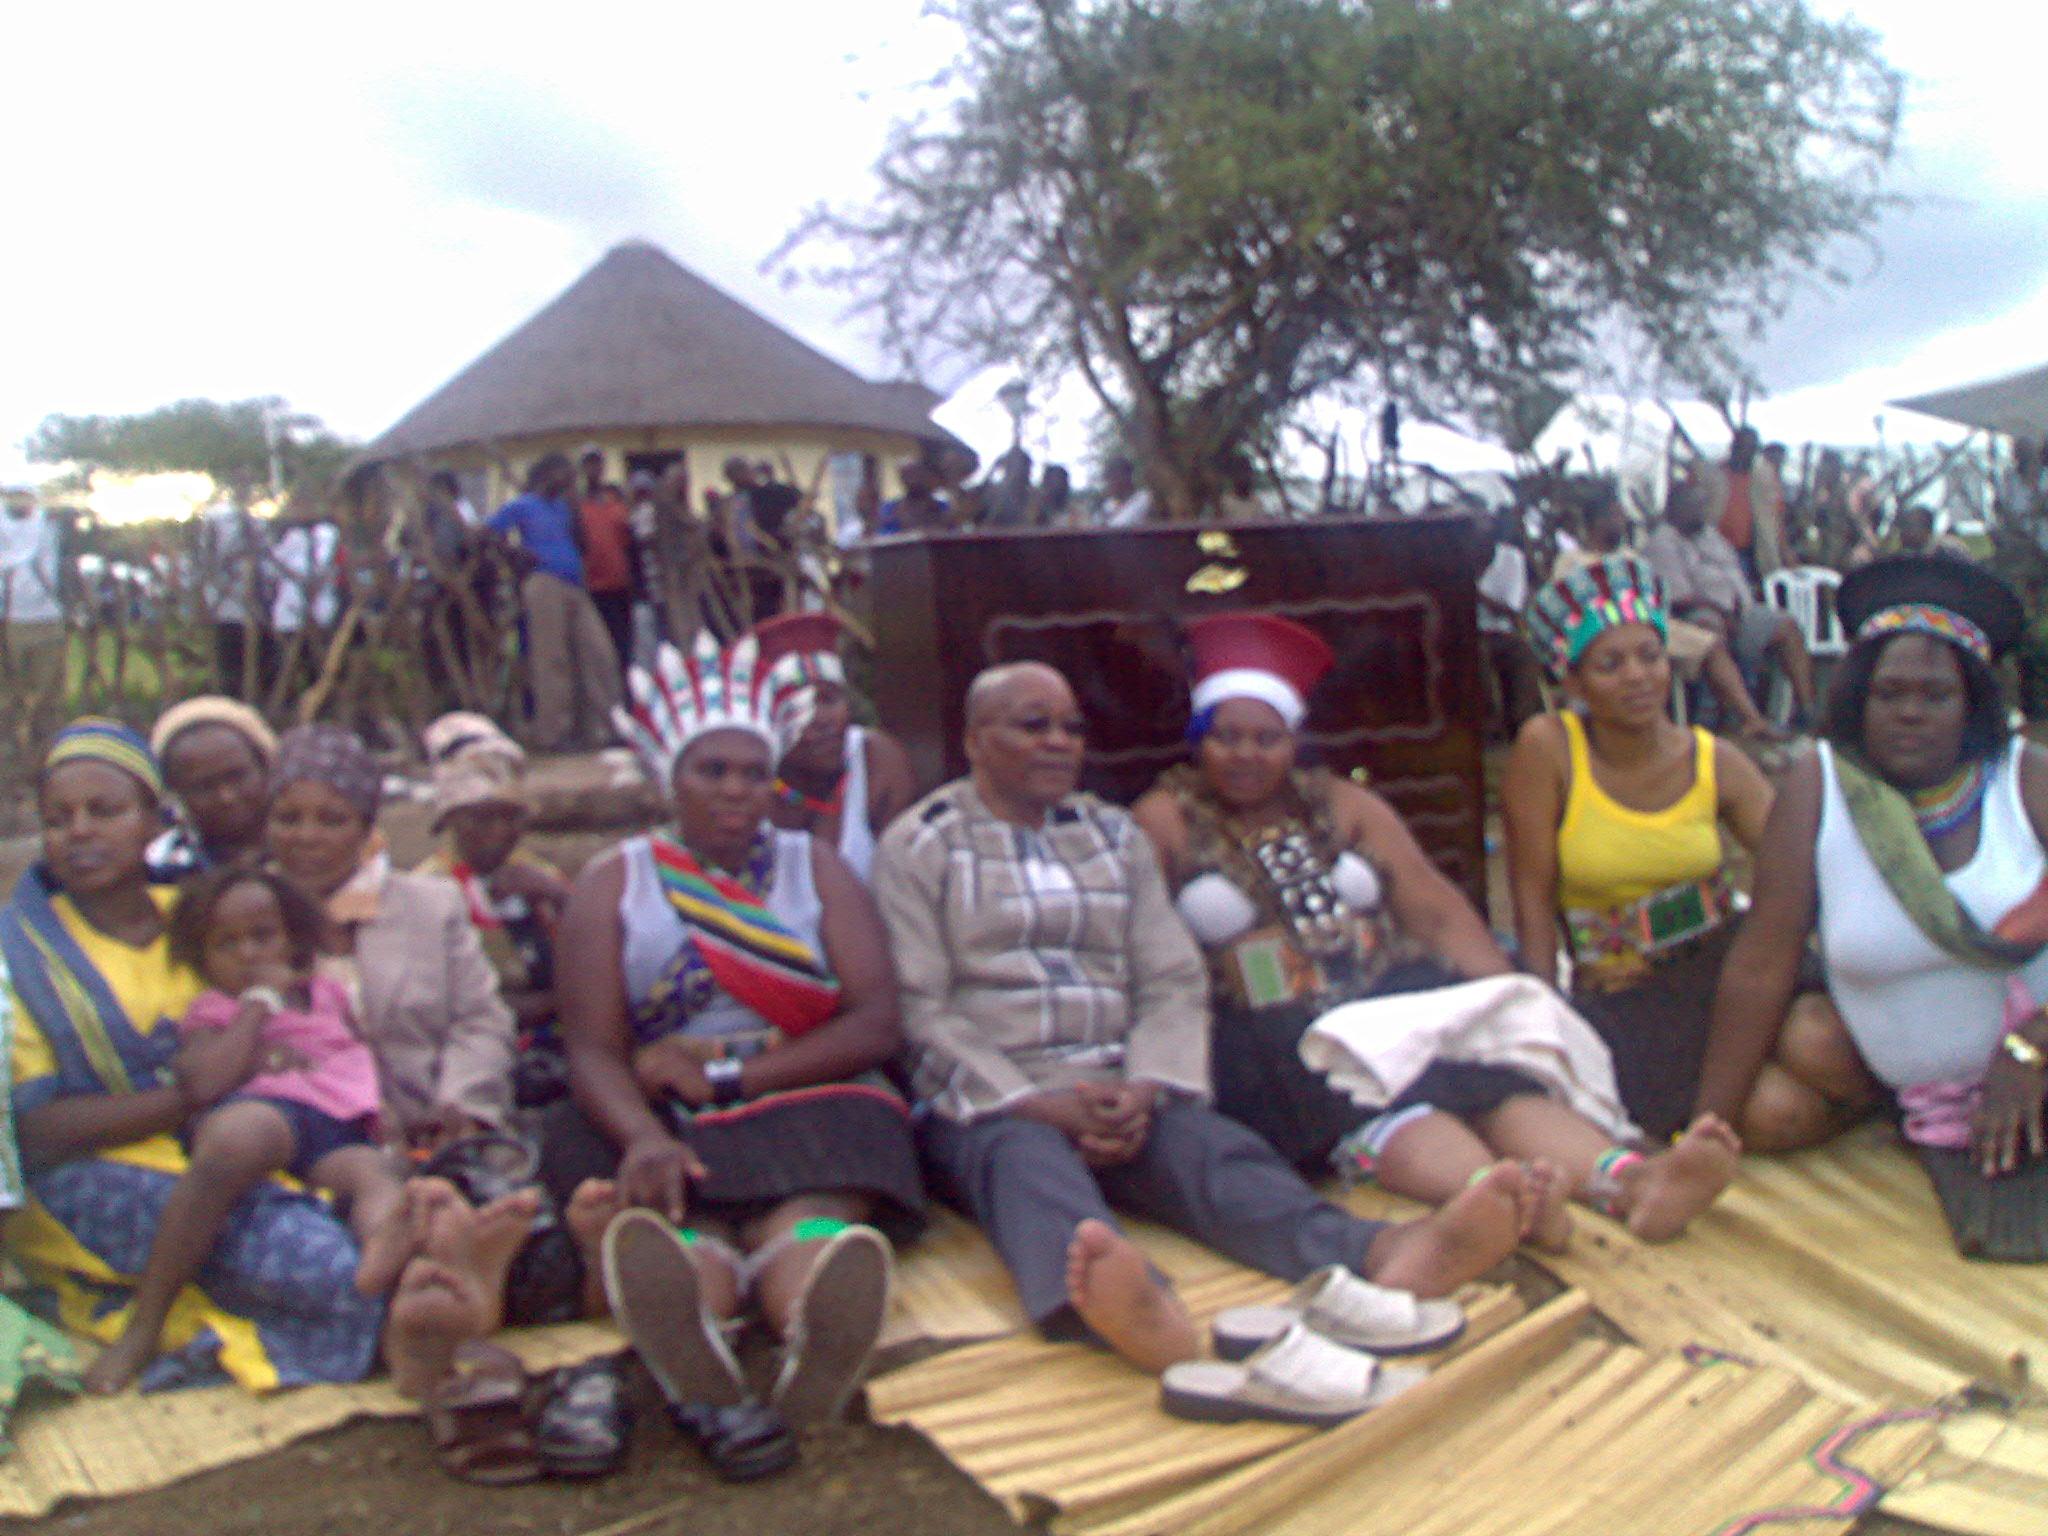 Jacob Zuma: president of South Africa /static/Zulu/zuma2.jpg